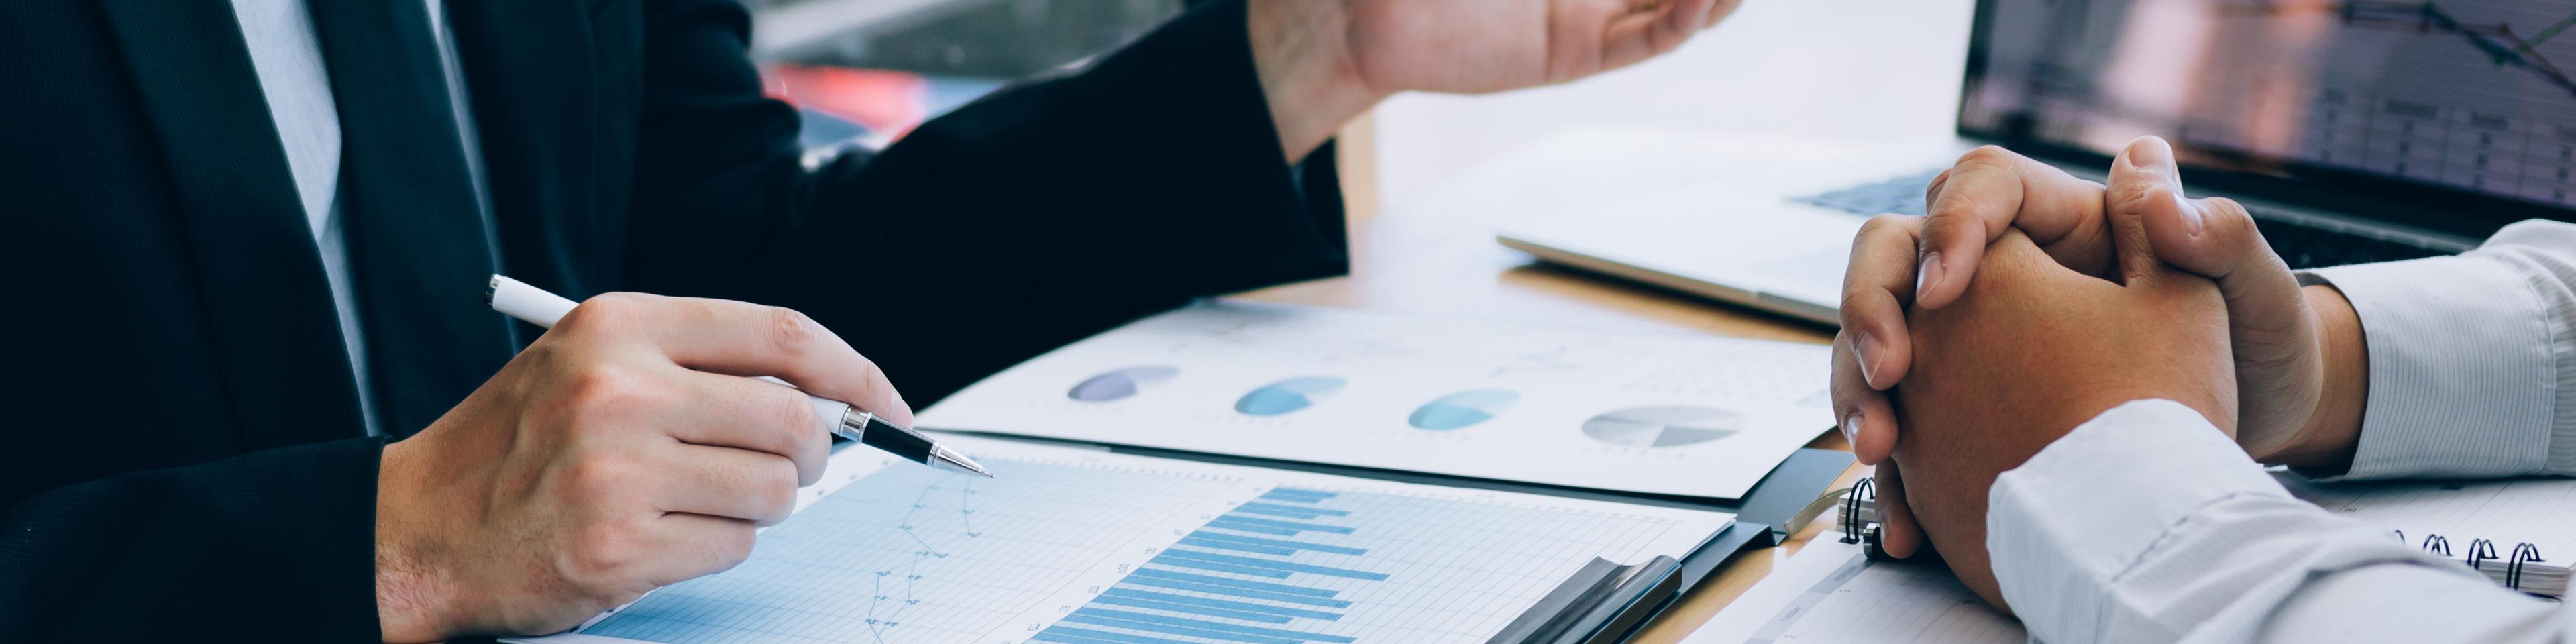 Chartis DataManagement Research hero